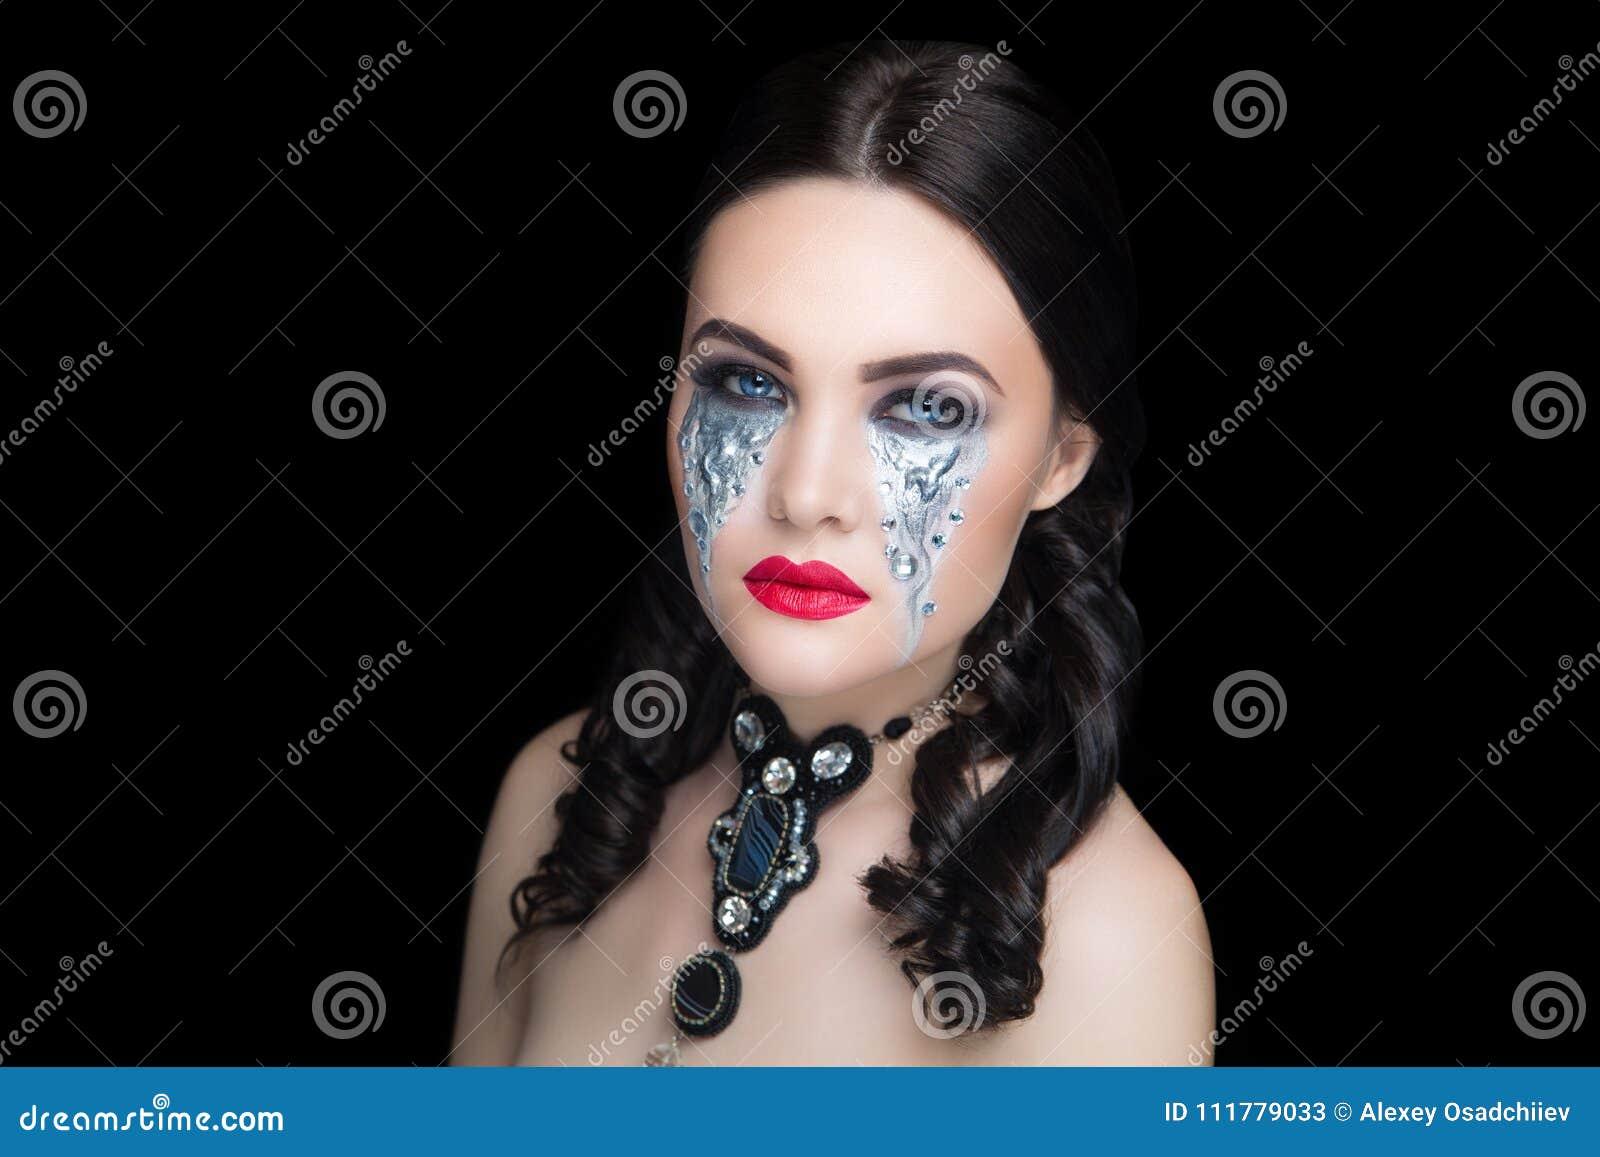 Woman art make up silver tears